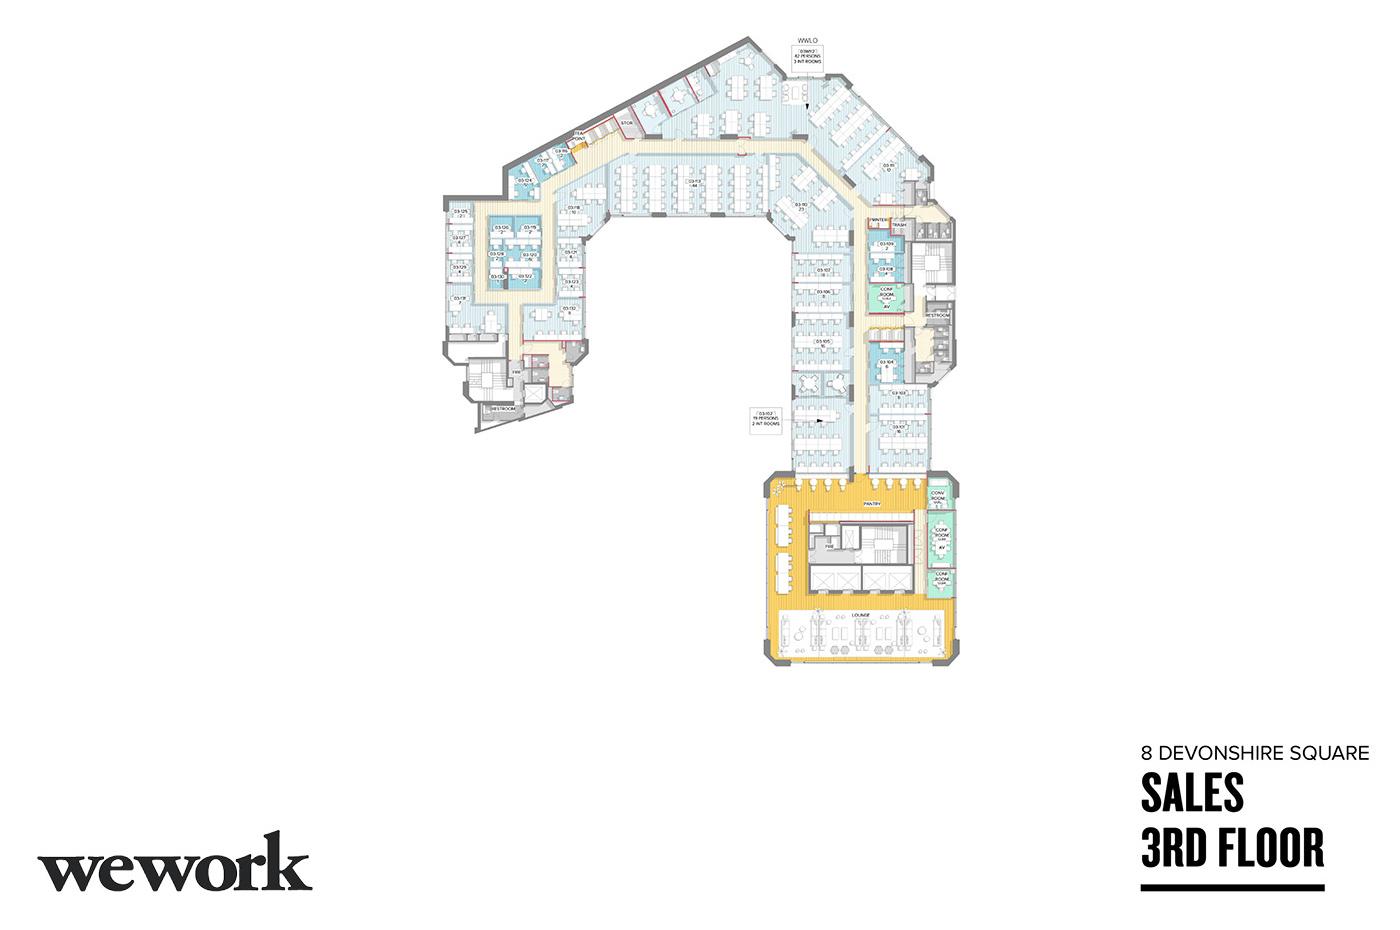 floorplans-4 copy.jpg